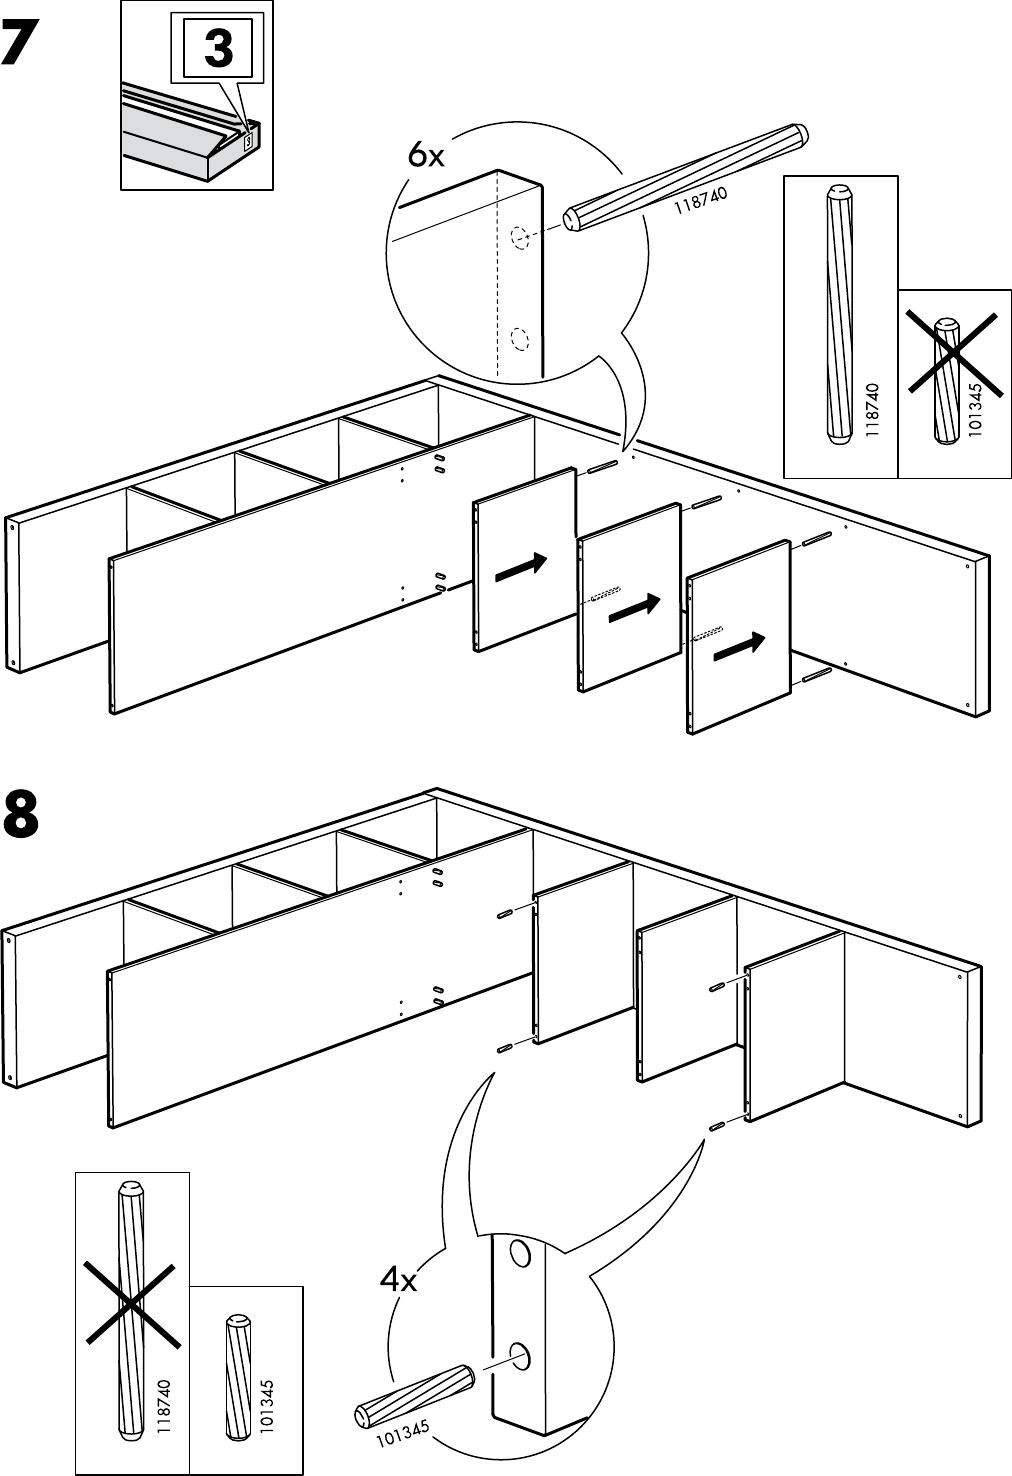 Expedit Tv Kast.Handleiding Ikea Expedit Tv Kast Pagina 14 Van 32 Alle Talen